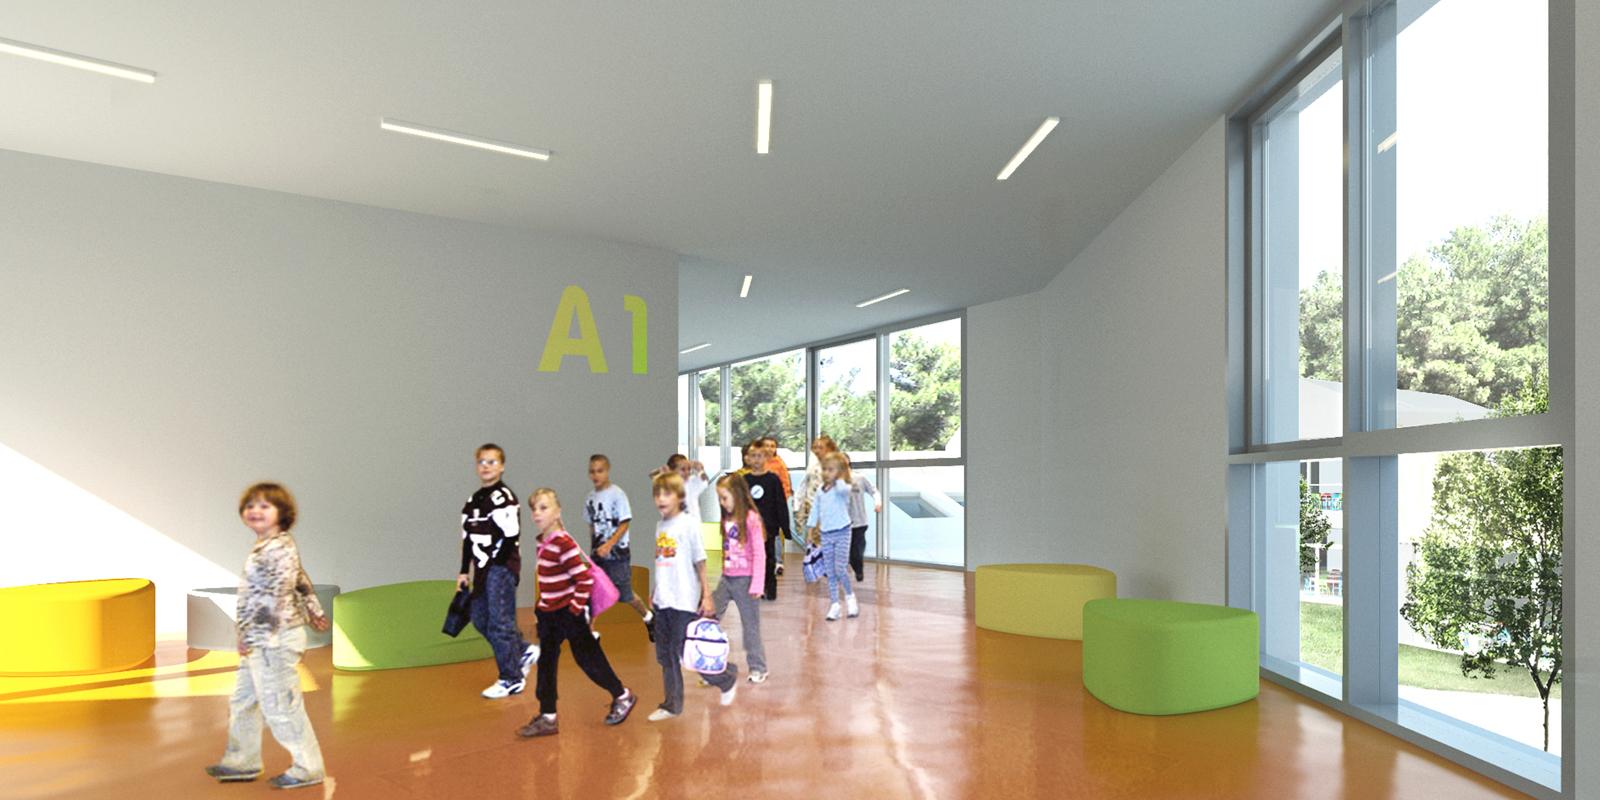 Anatolia Elementary